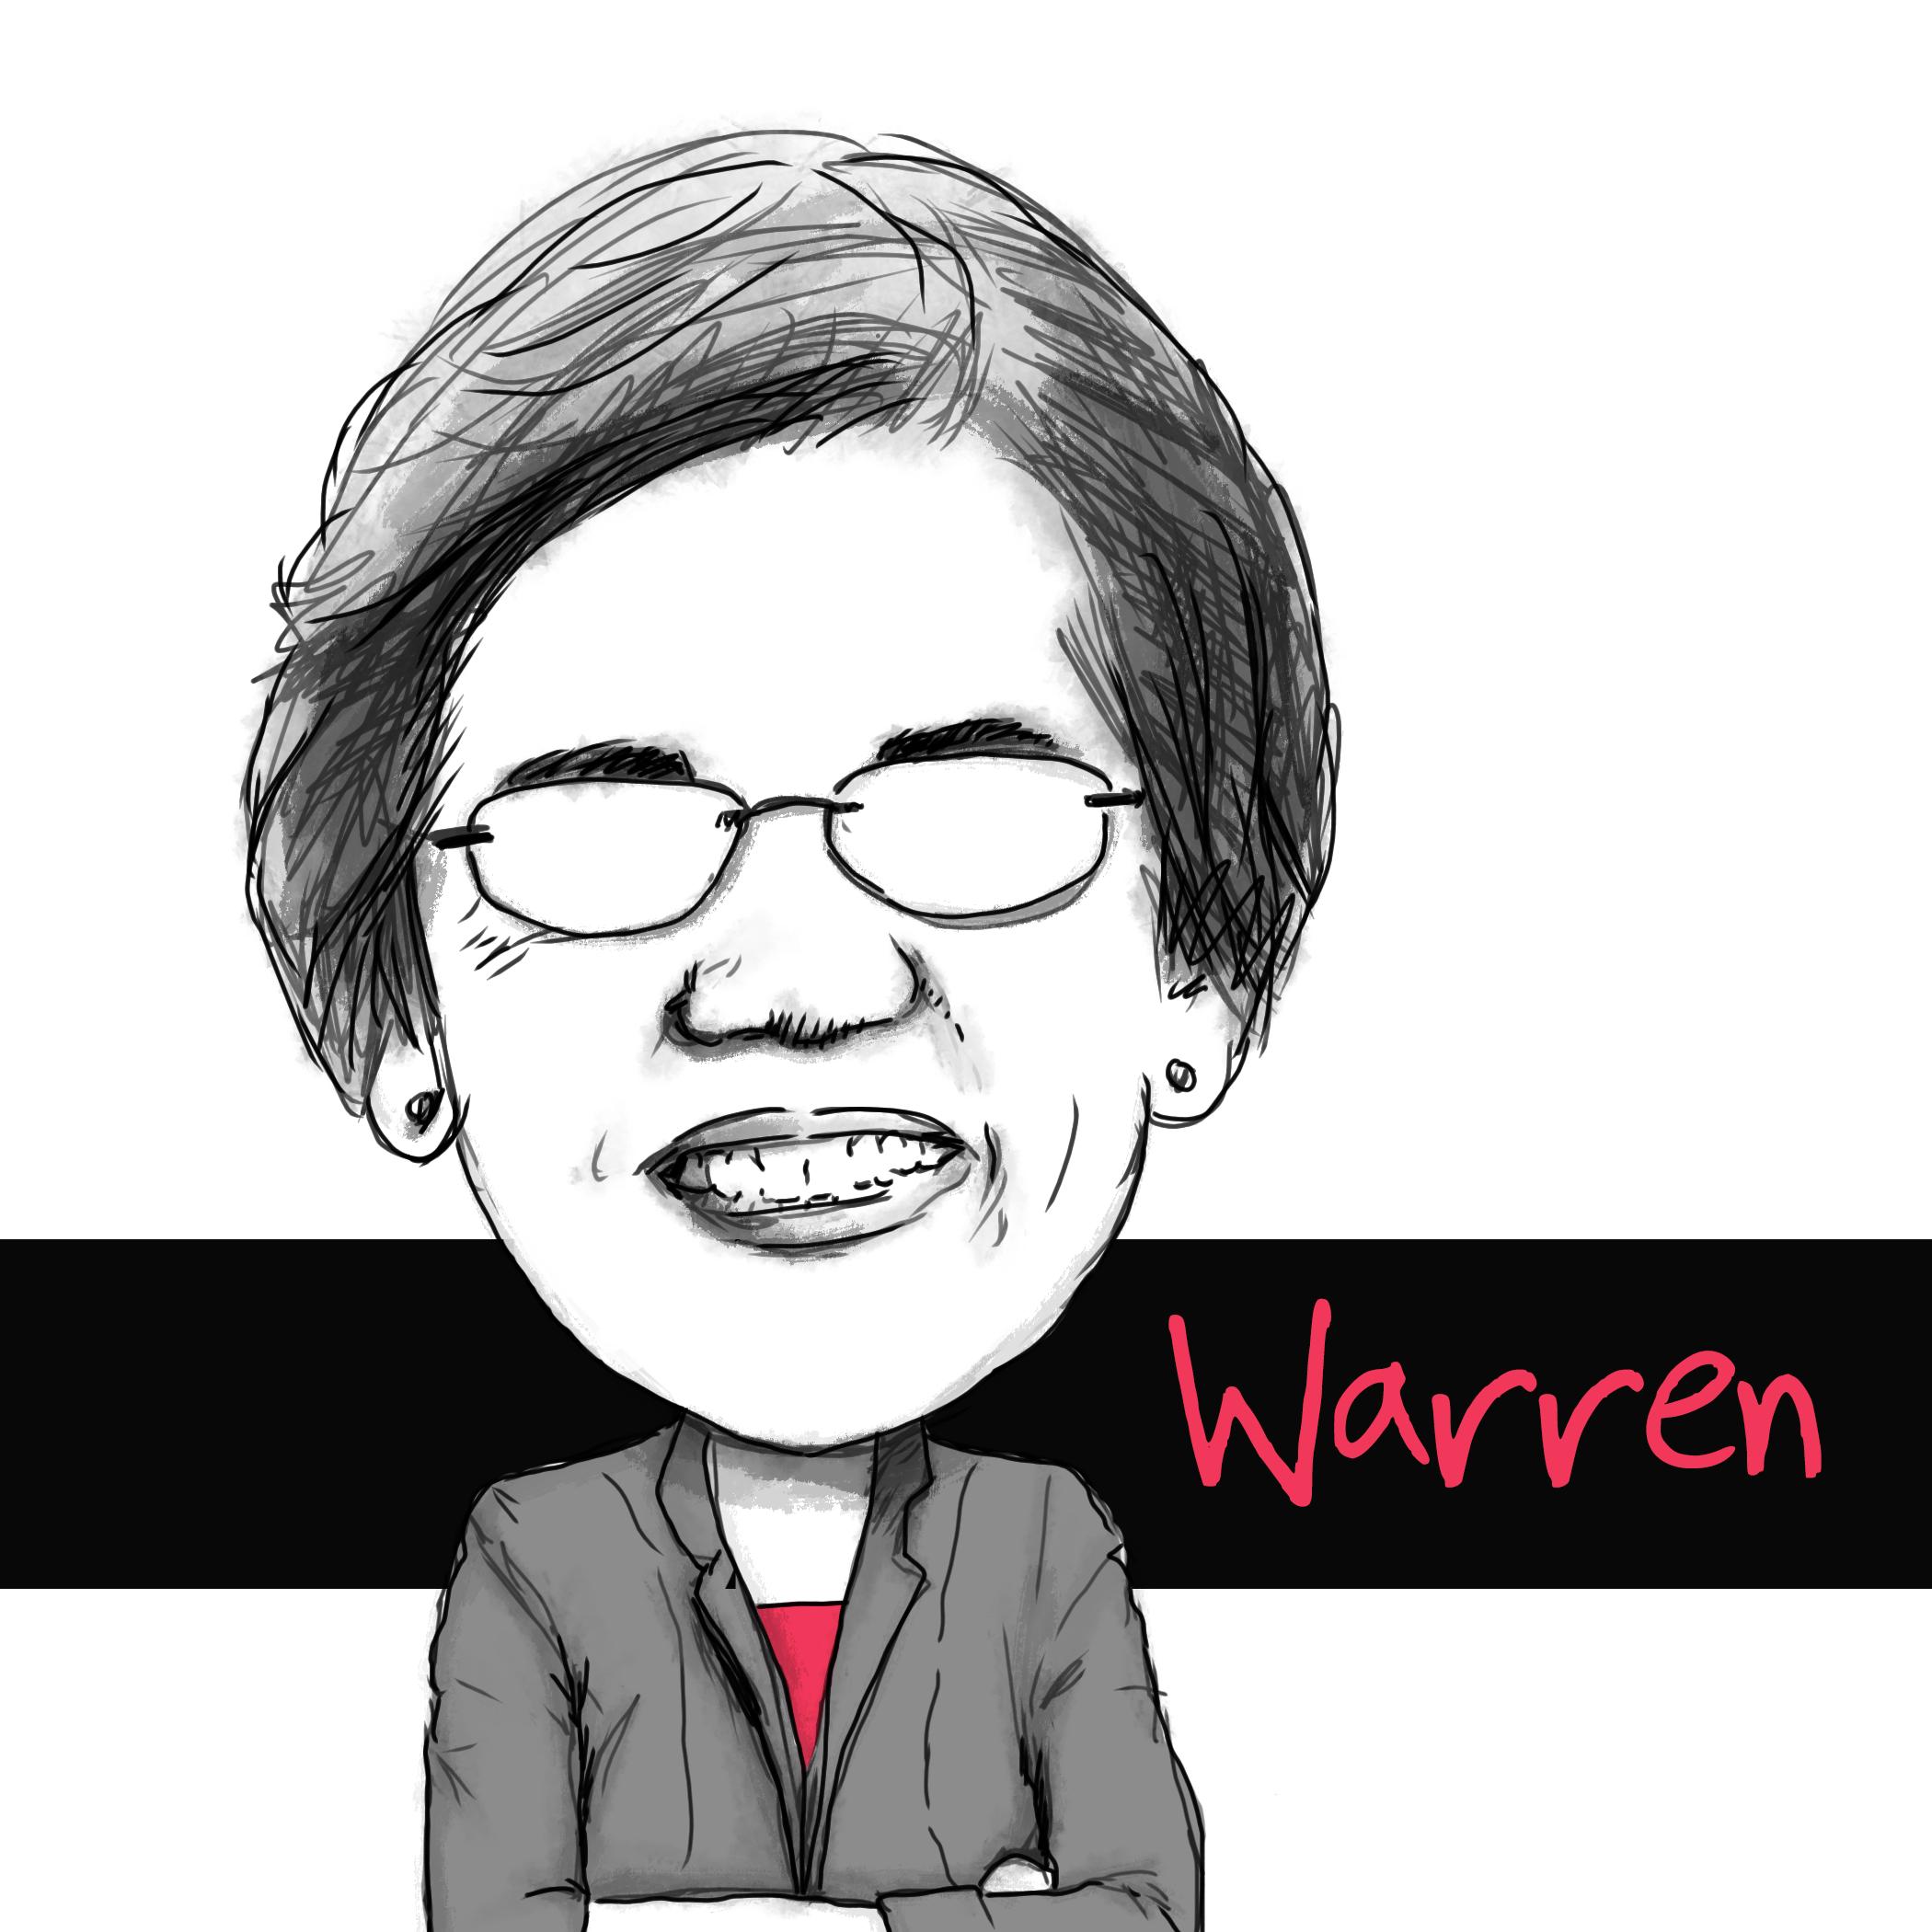 Elizabeth Warren - Together we will save democracy - https://elizabethwarren.com